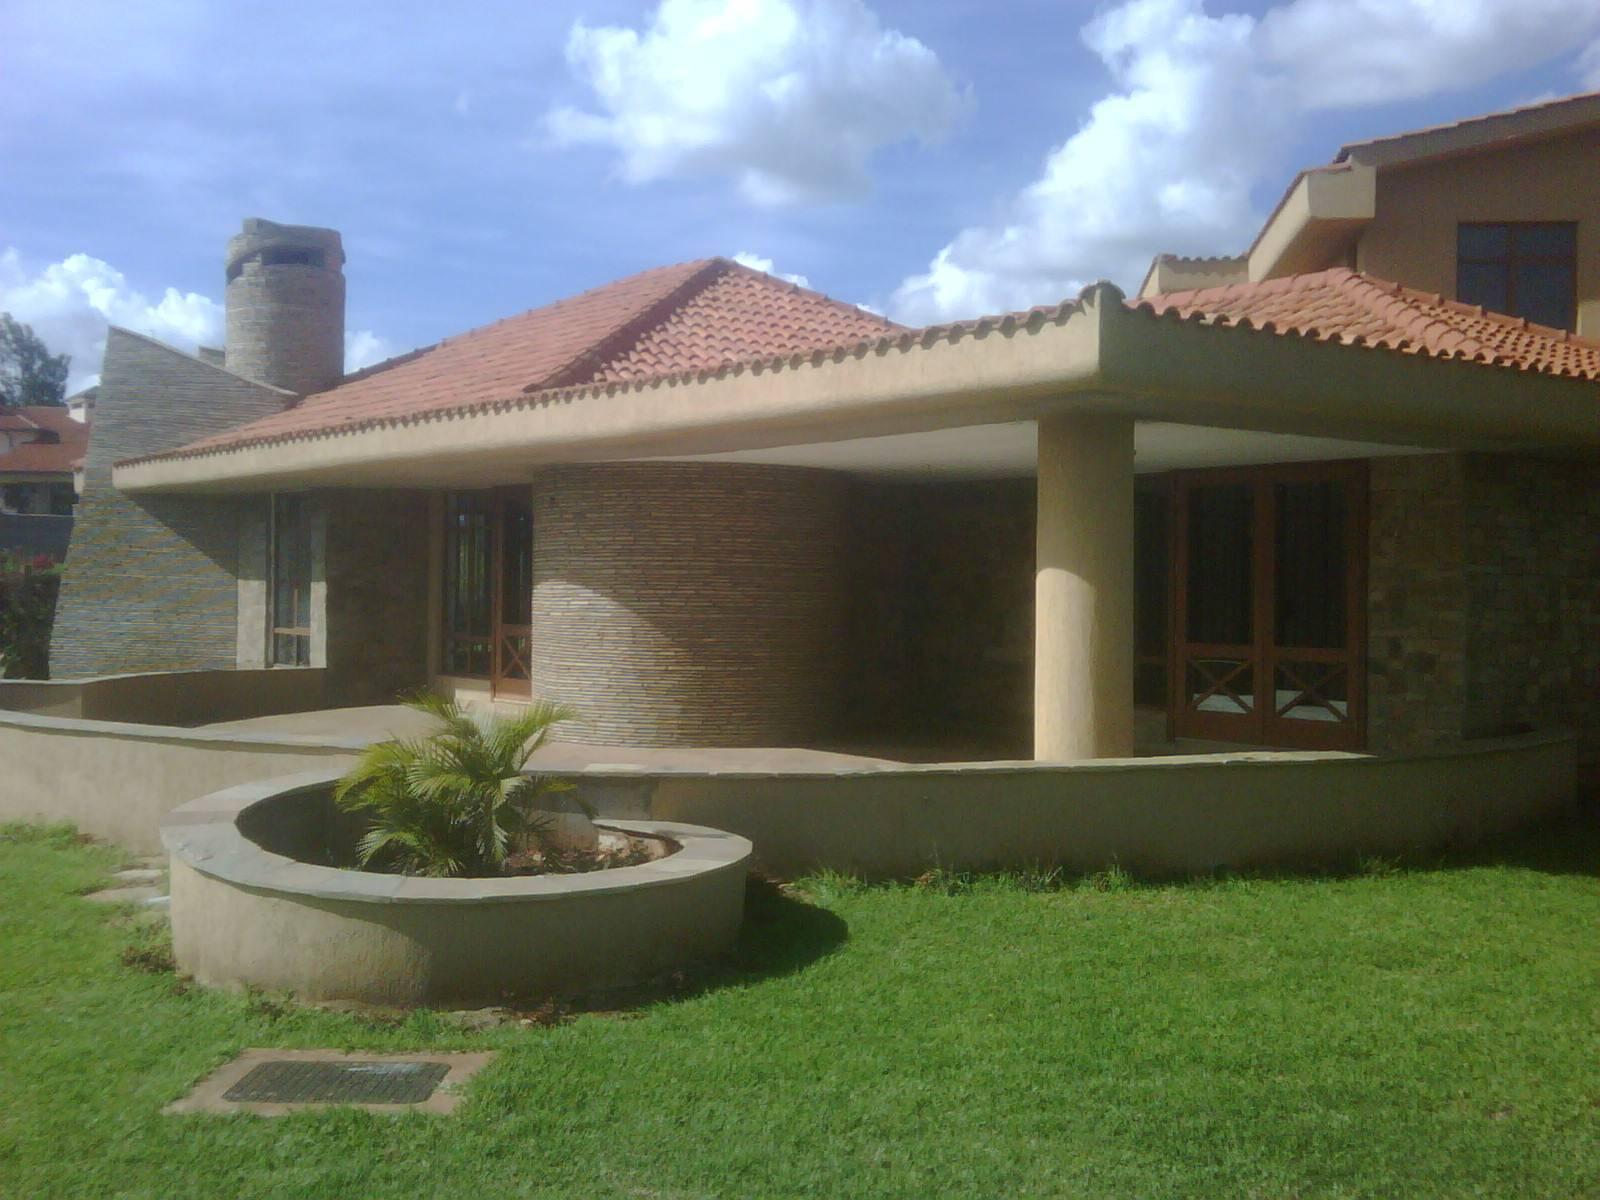 Villa for rent nairobi nairobi area kenya to let villa in runda eagle park md593671 360000 kes 2010 12 08 mondinion com global real estate